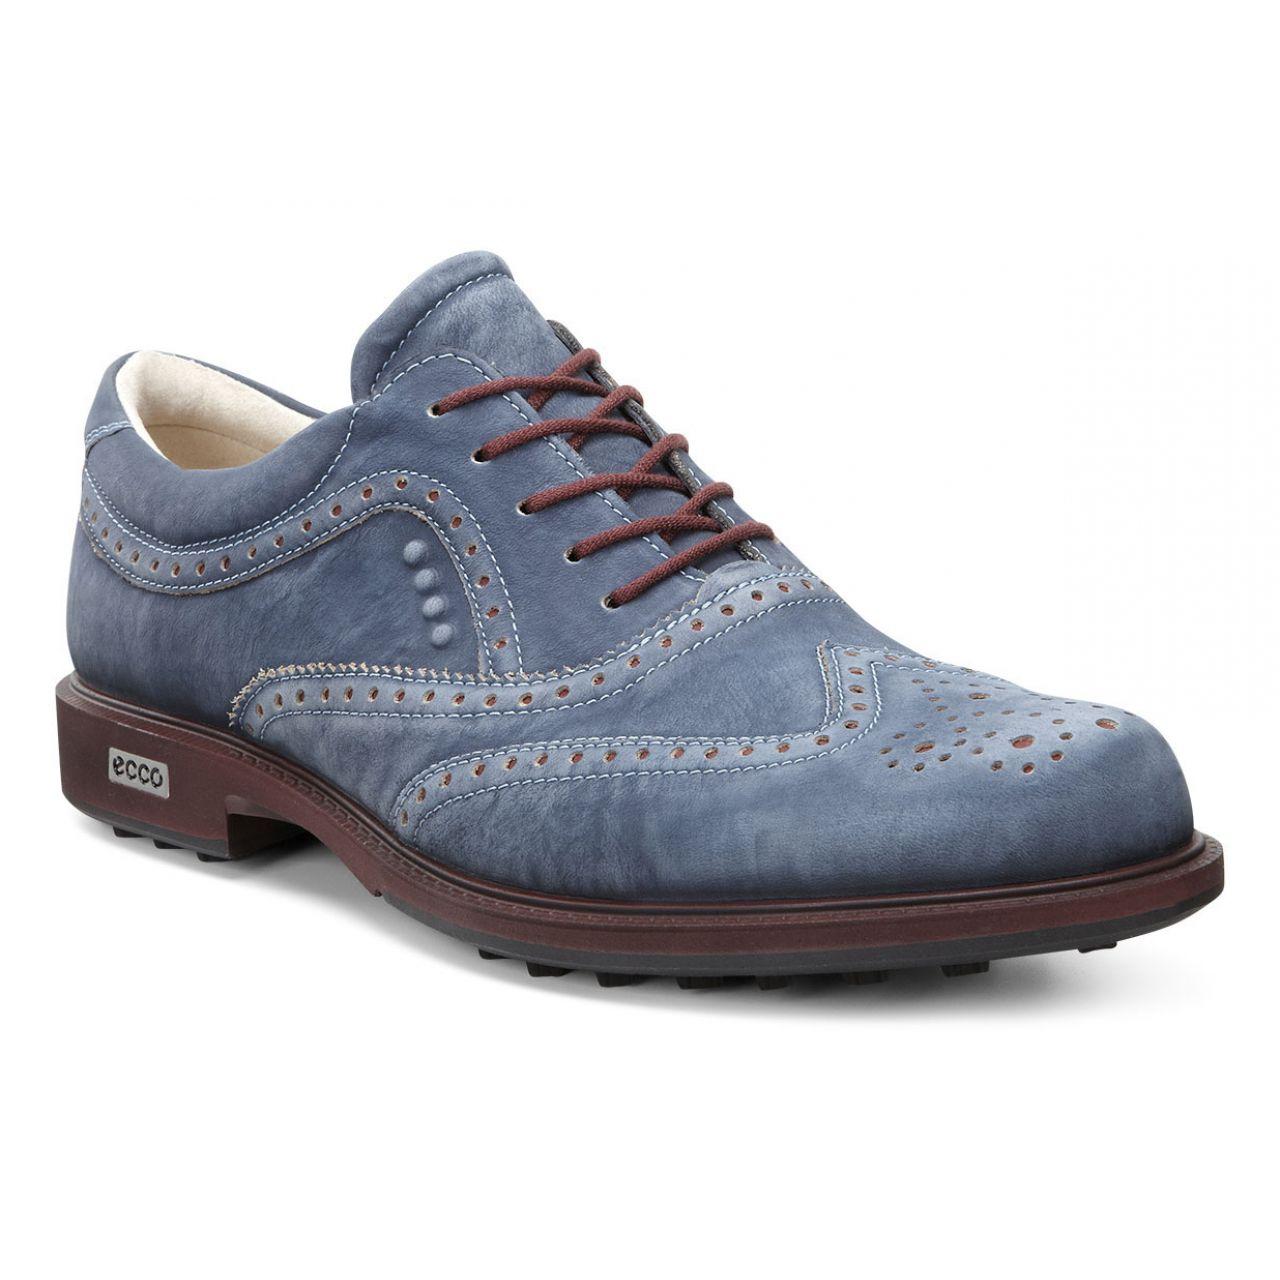 Duca Del Cosma Golf Shoes Sale